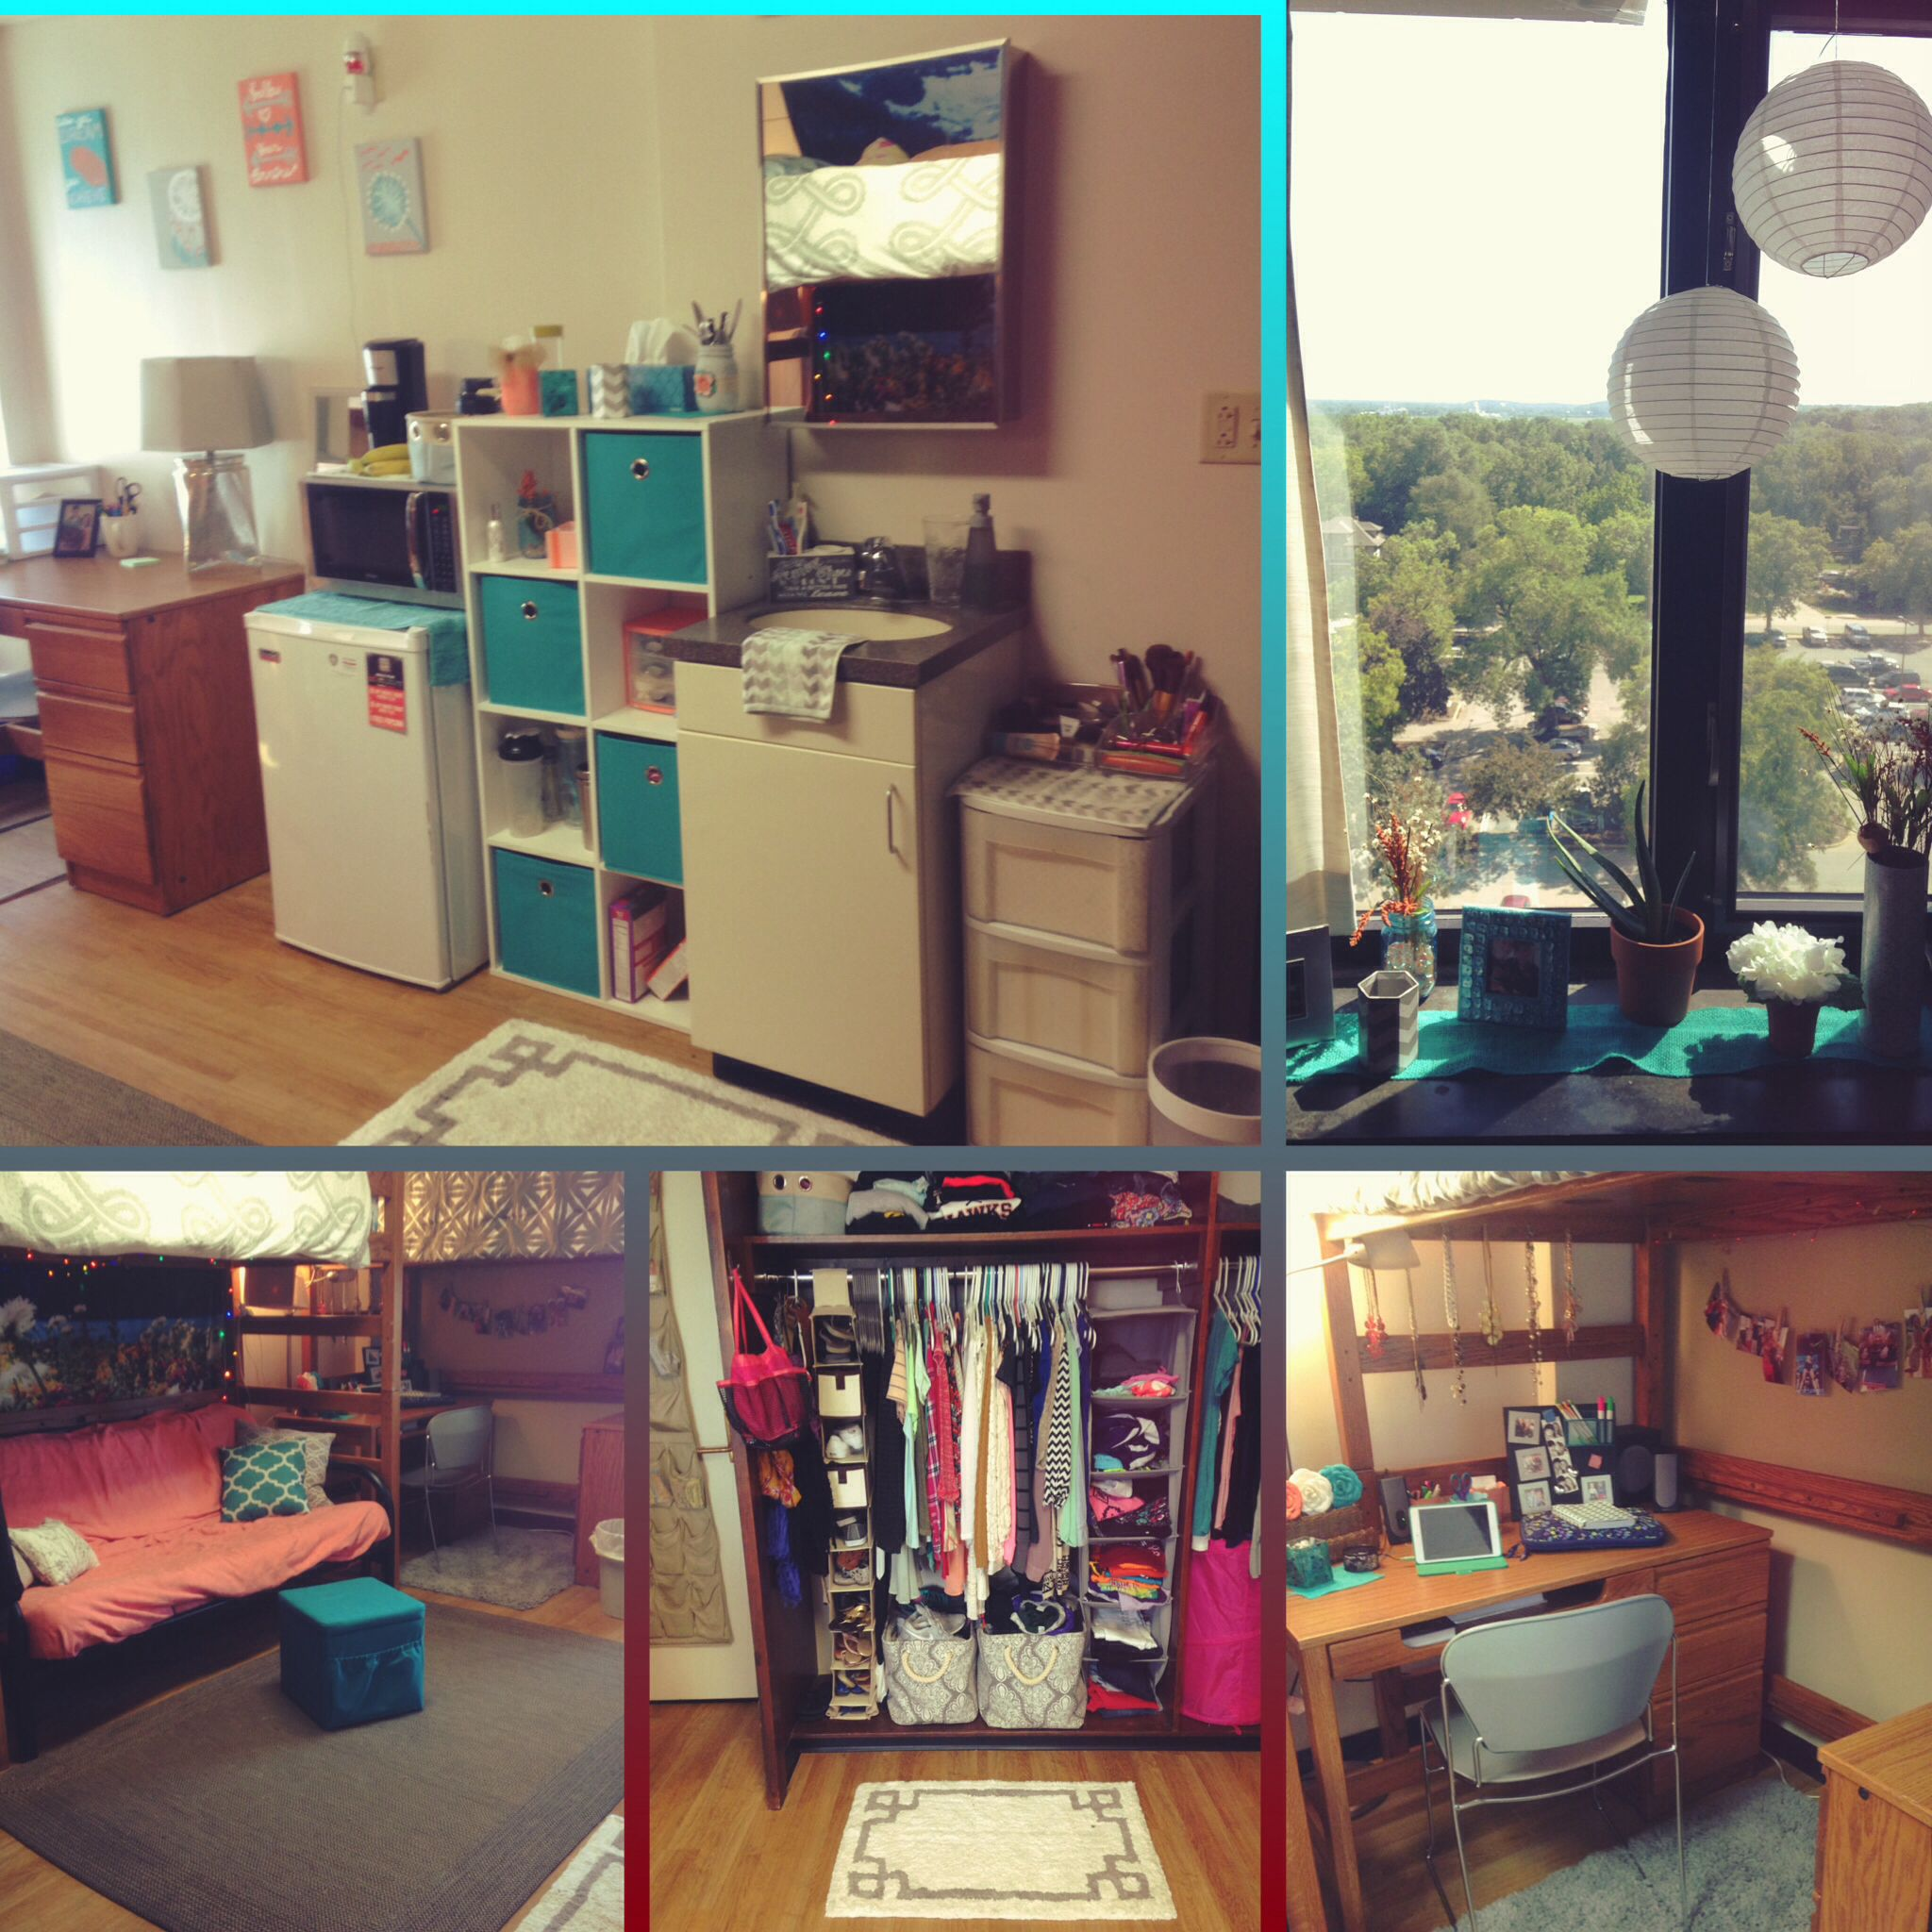 Captivating University Of Iowa Slater Hall Cute Dorm Room! Part 12